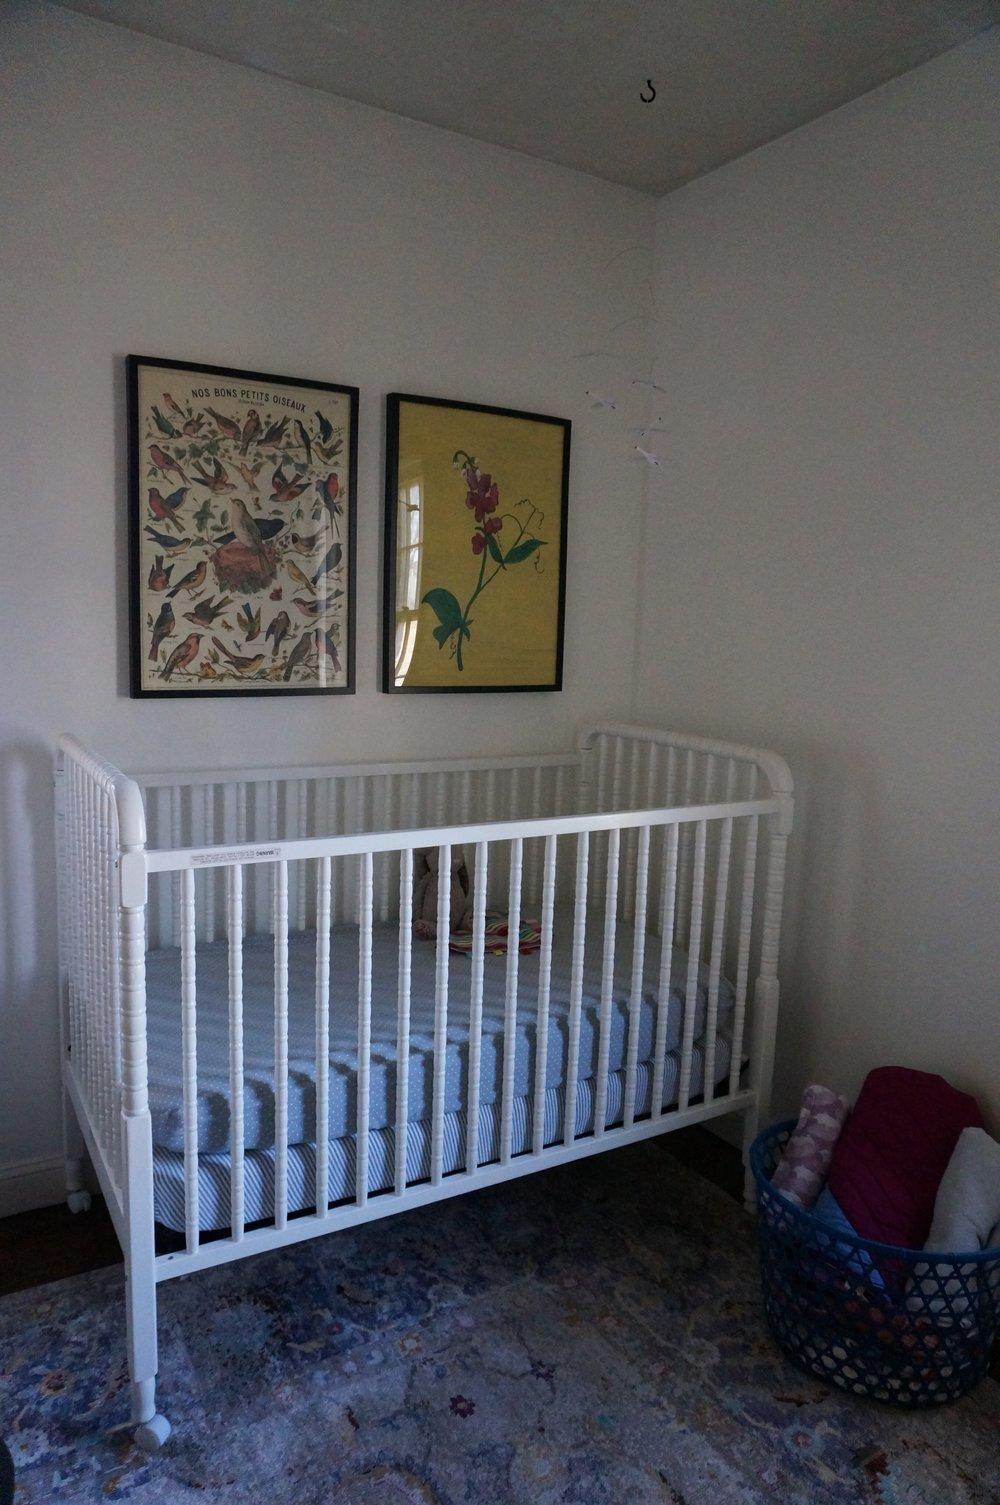 Penelope's Room (Crib) | Cassia & Co.